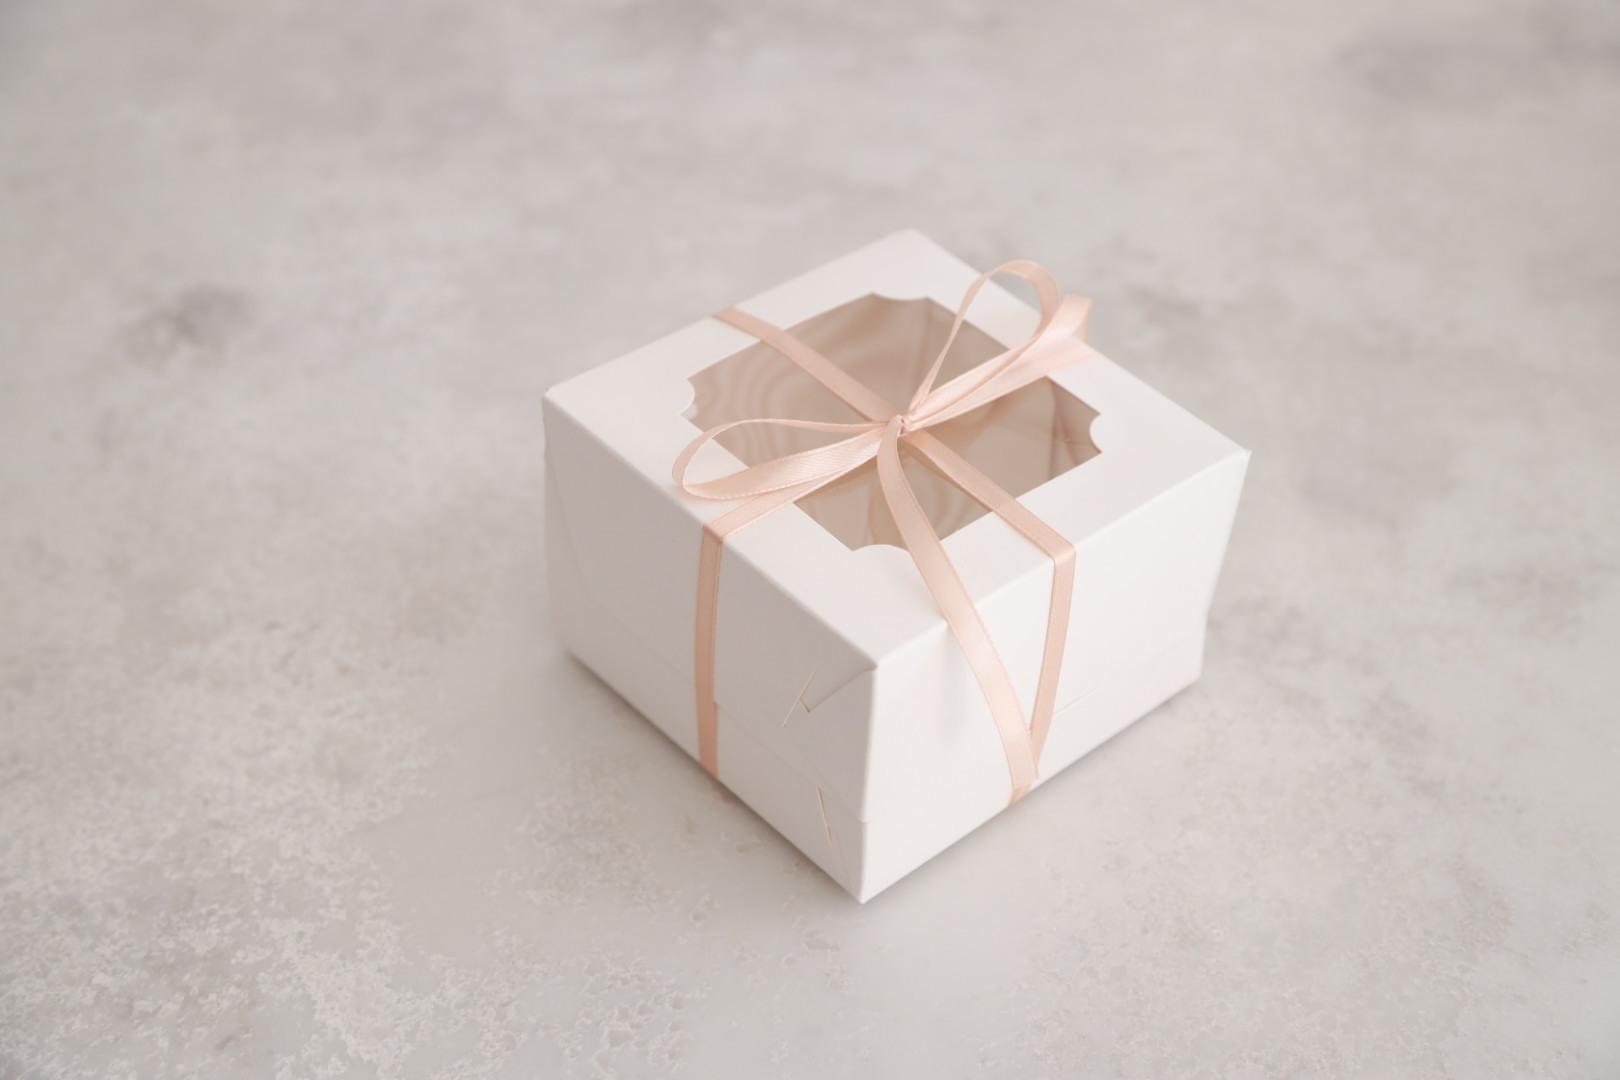 Коробка для БЕНТО торта с окном, 12х12х8 см